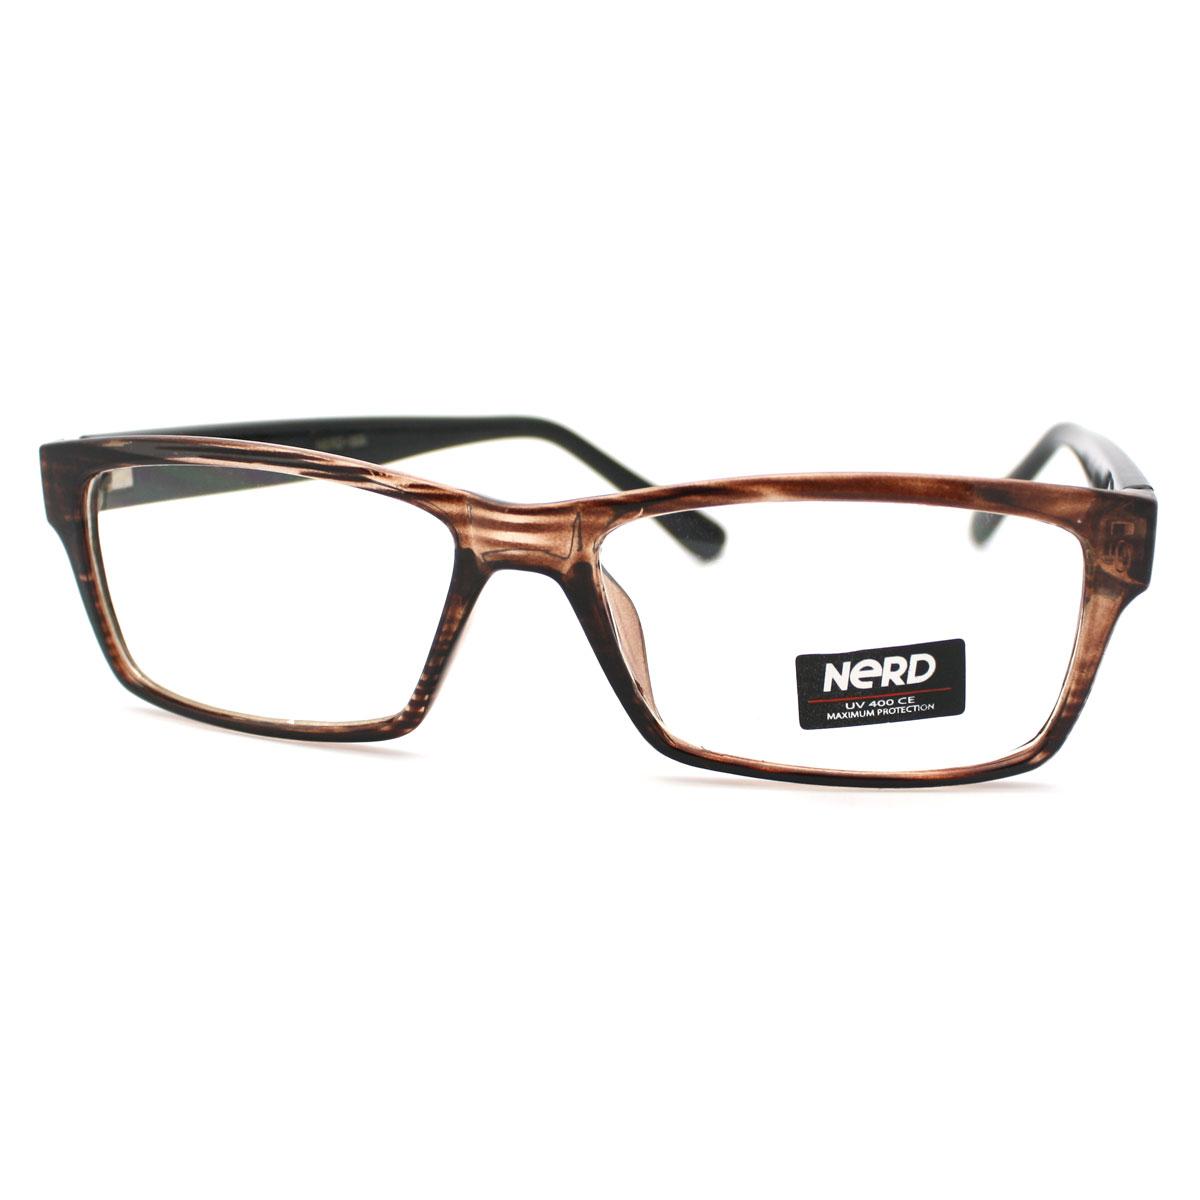 Narrow Frame Reading Glasses : Unisex New Geeky Nerd Narrow Rectangular Clear Lens ...